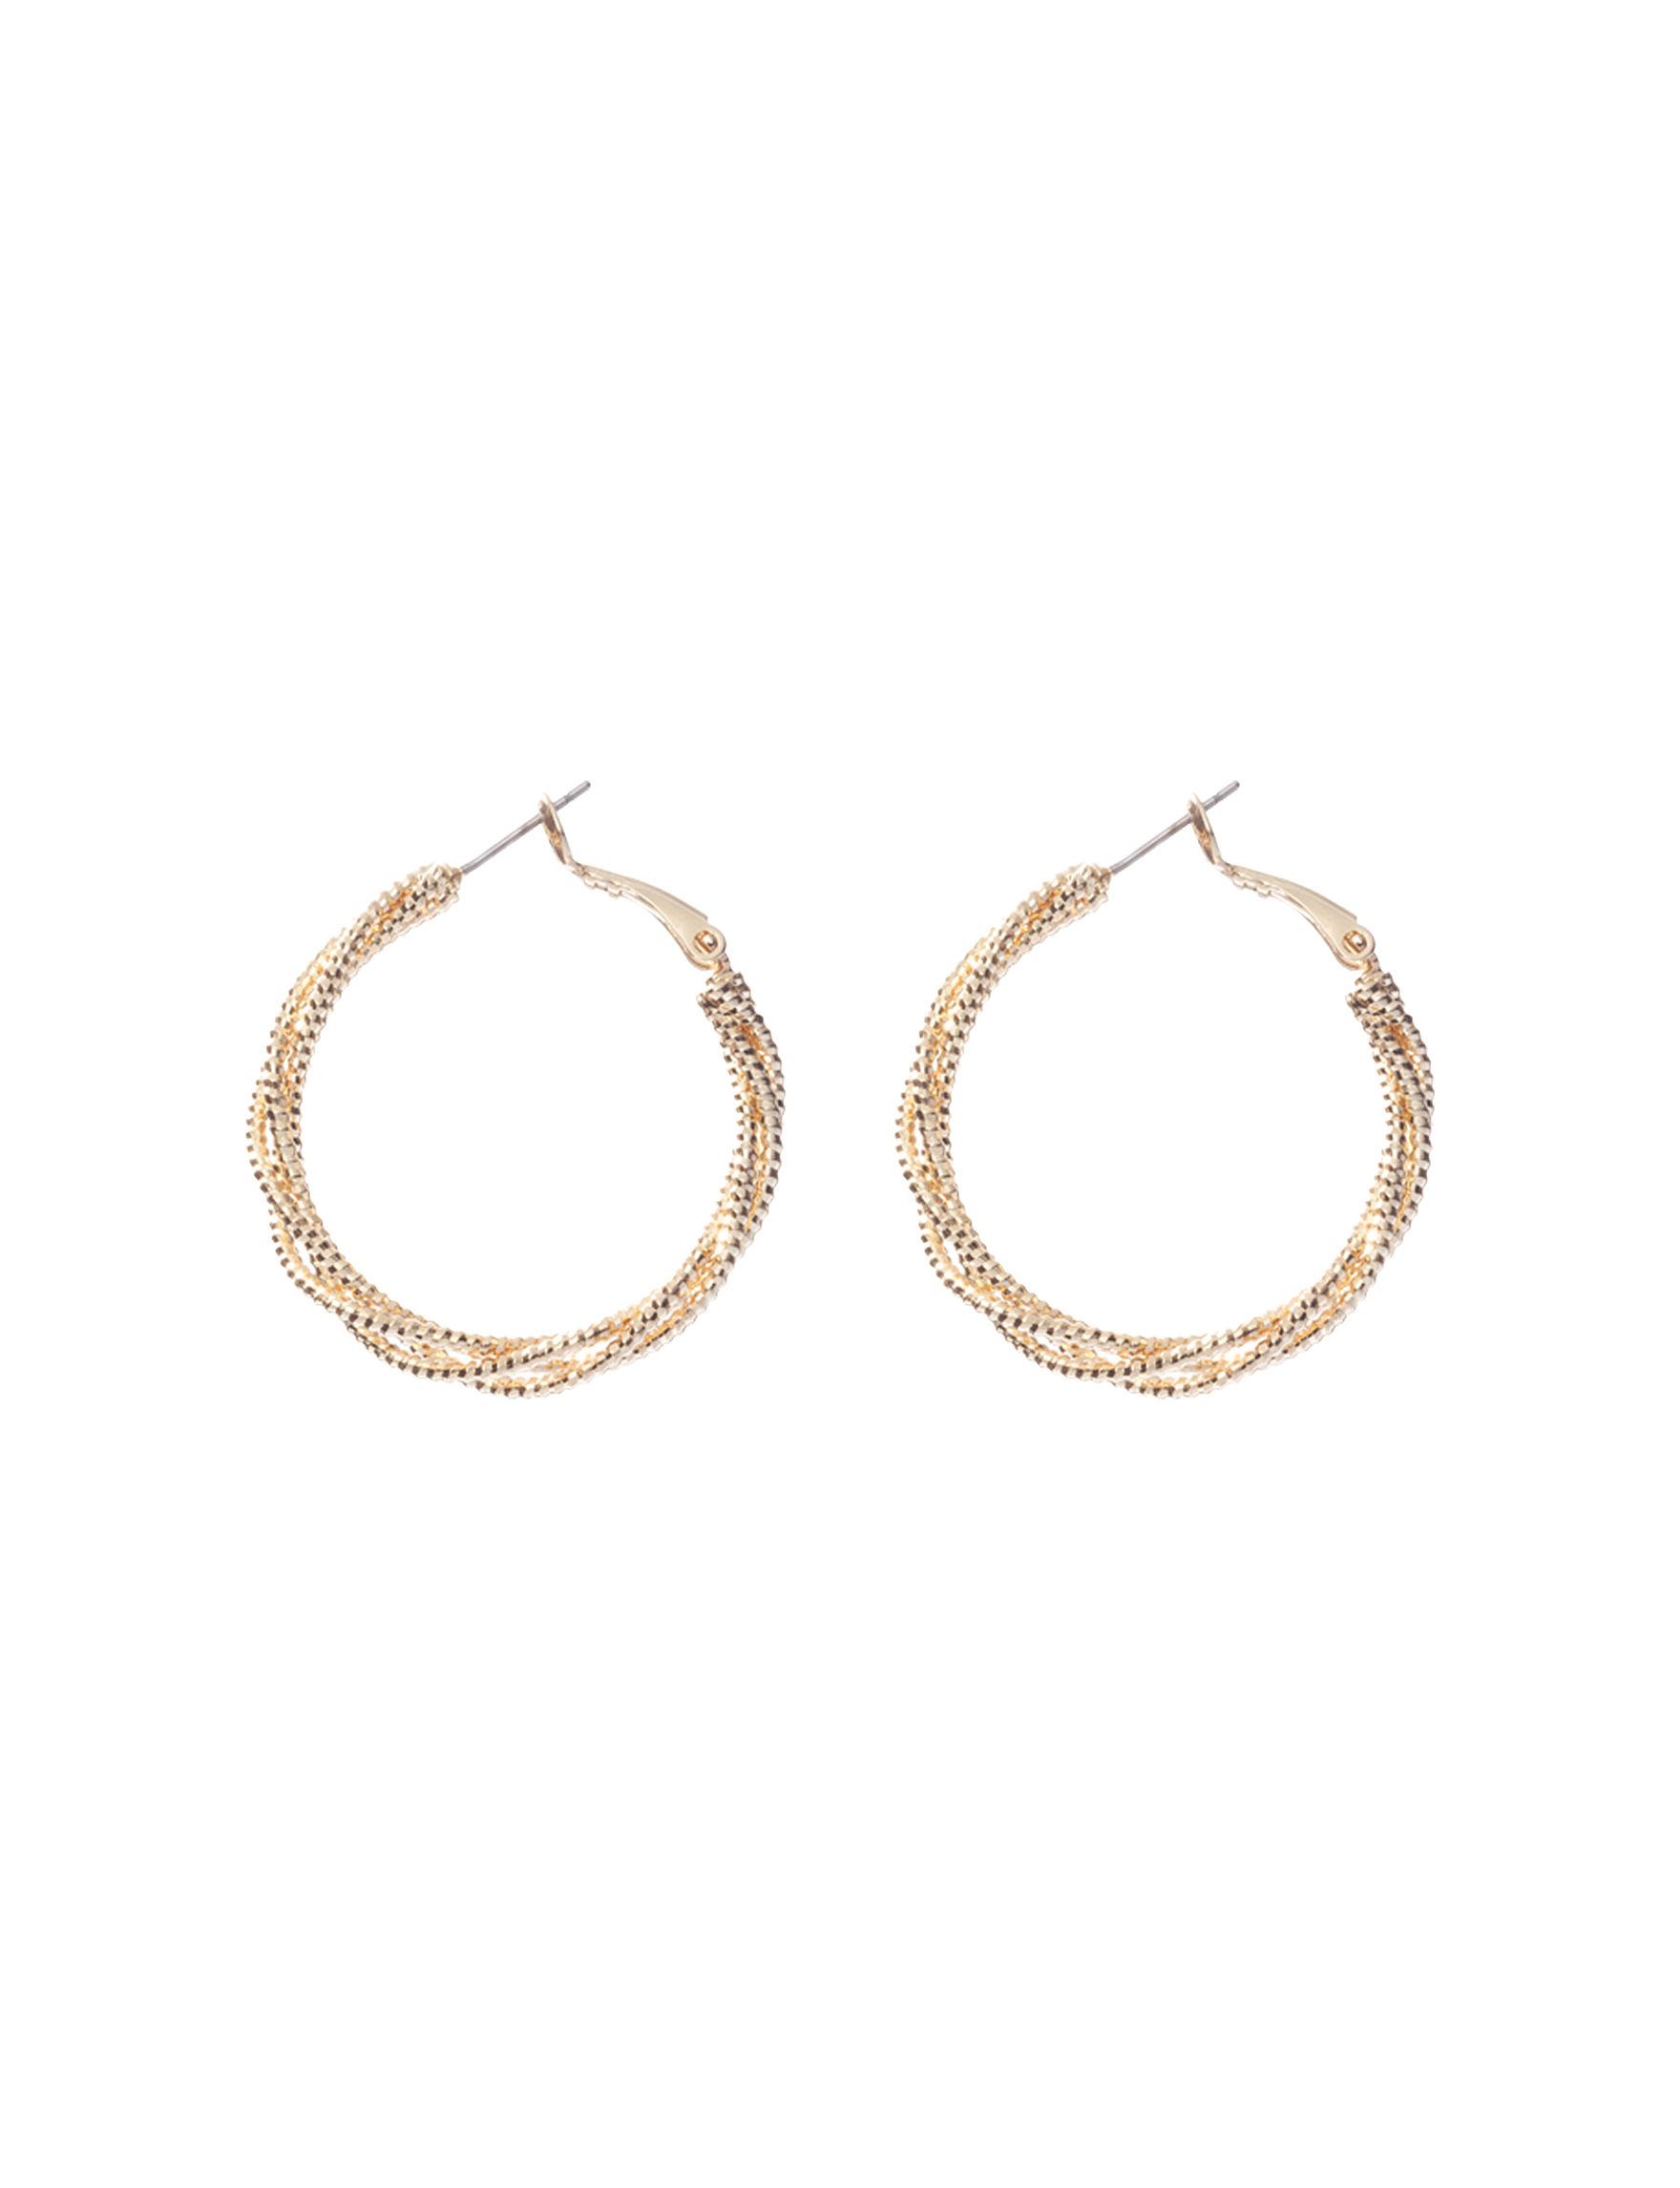 Signature Studio  Hoops Earrings Fashion Jewelry